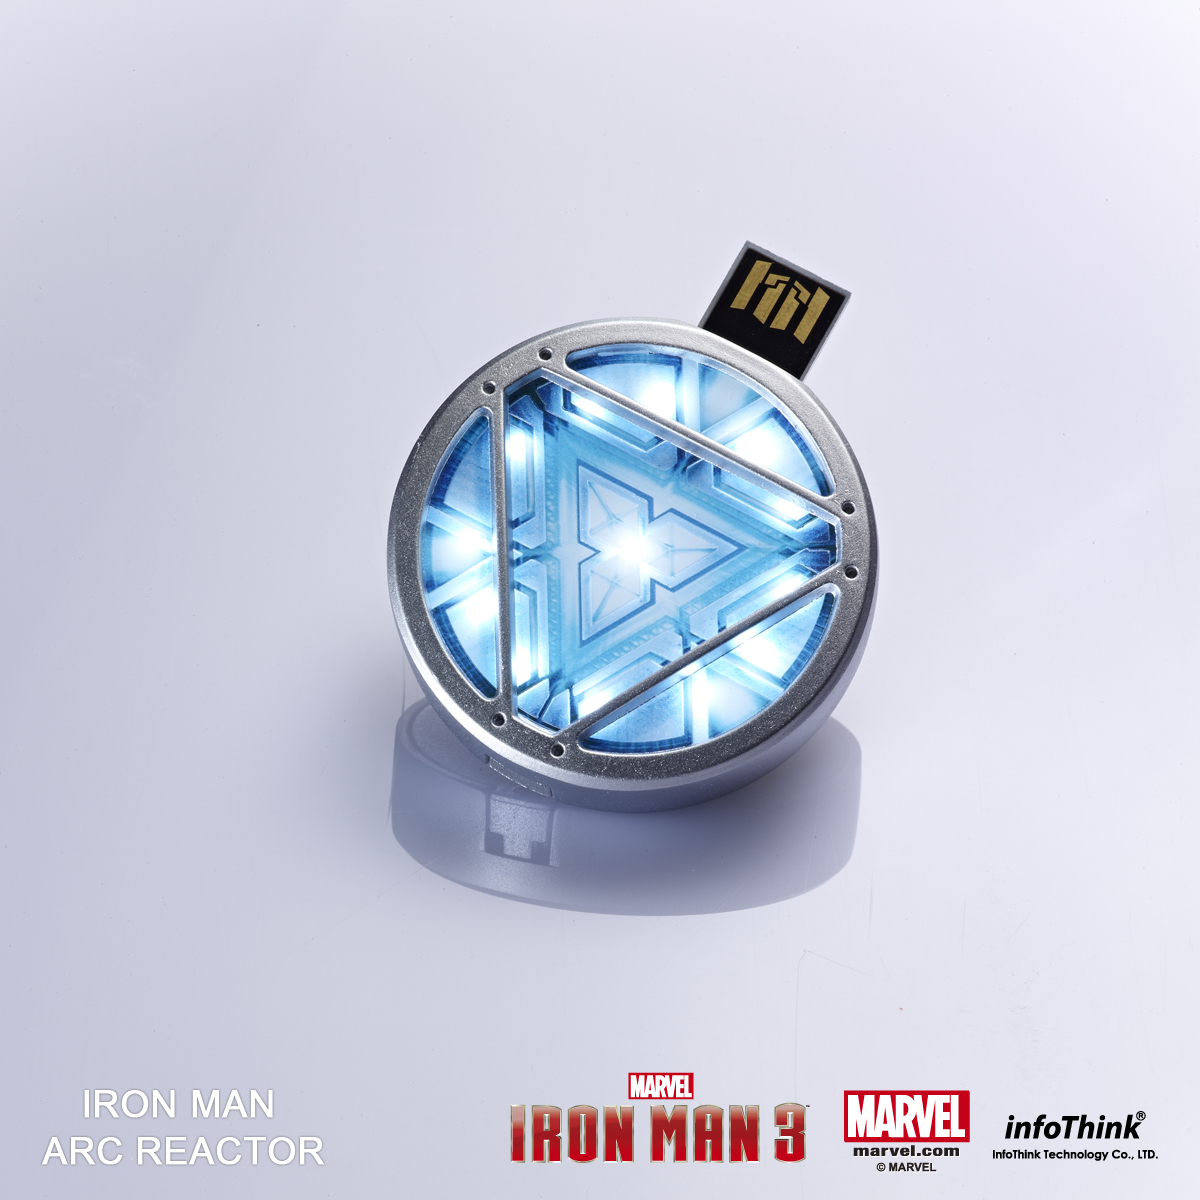 Iron Man S Arc Reactor Usb Drive